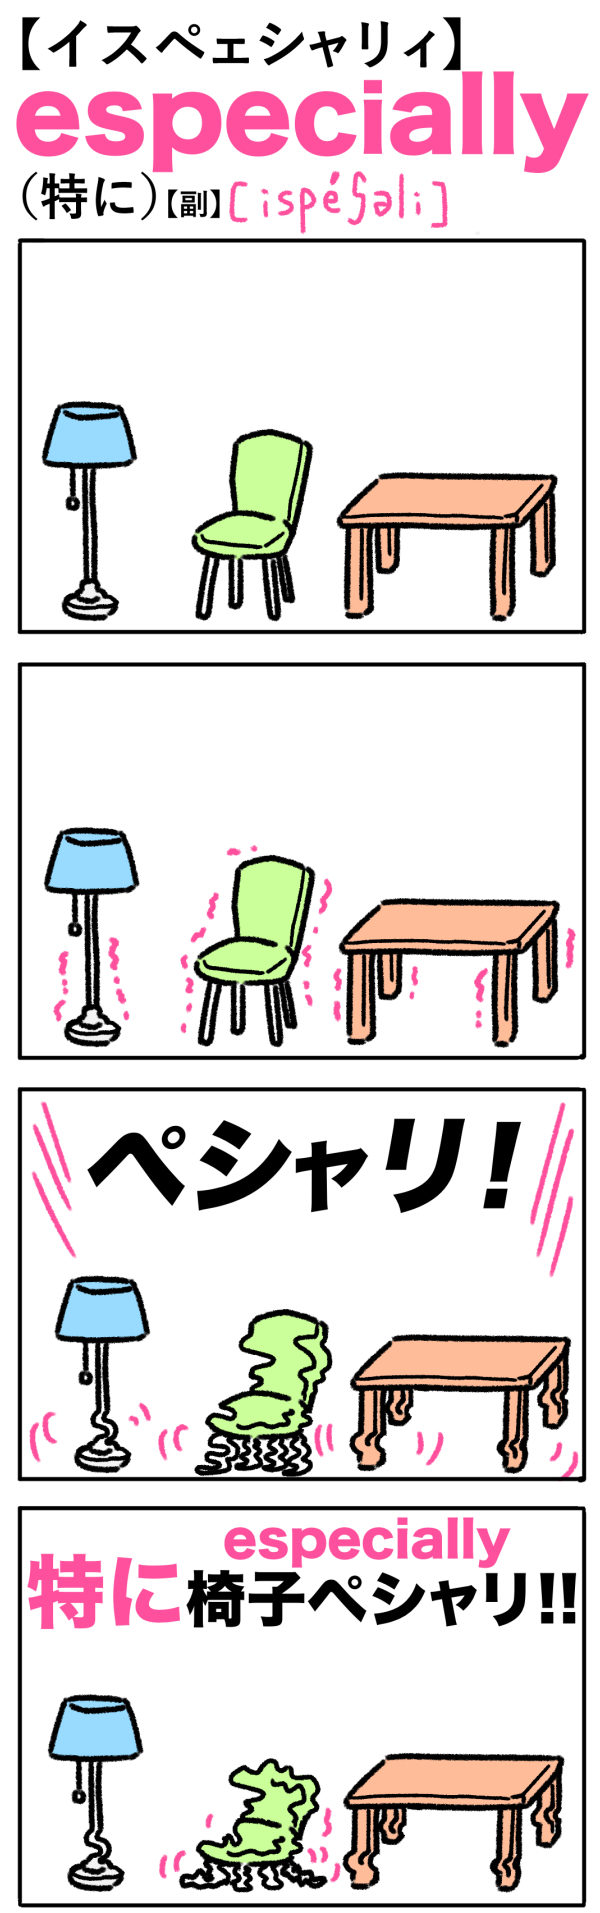 especially(特に)の語呂合わせ英単語